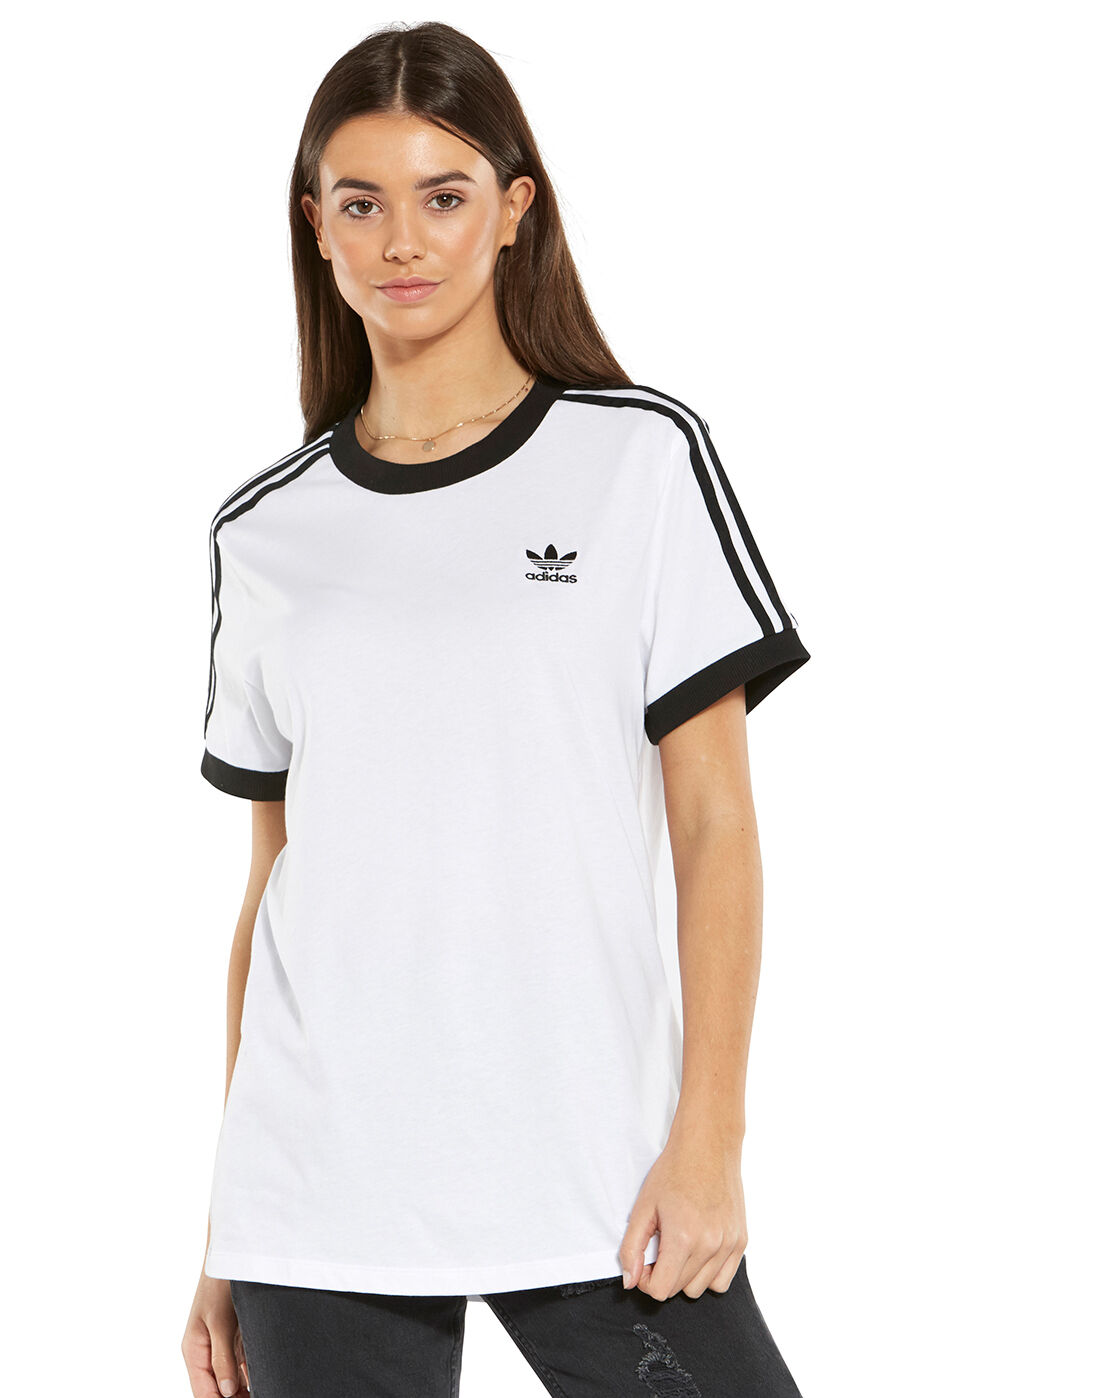 adidas originals 3 stripes t shirt women's